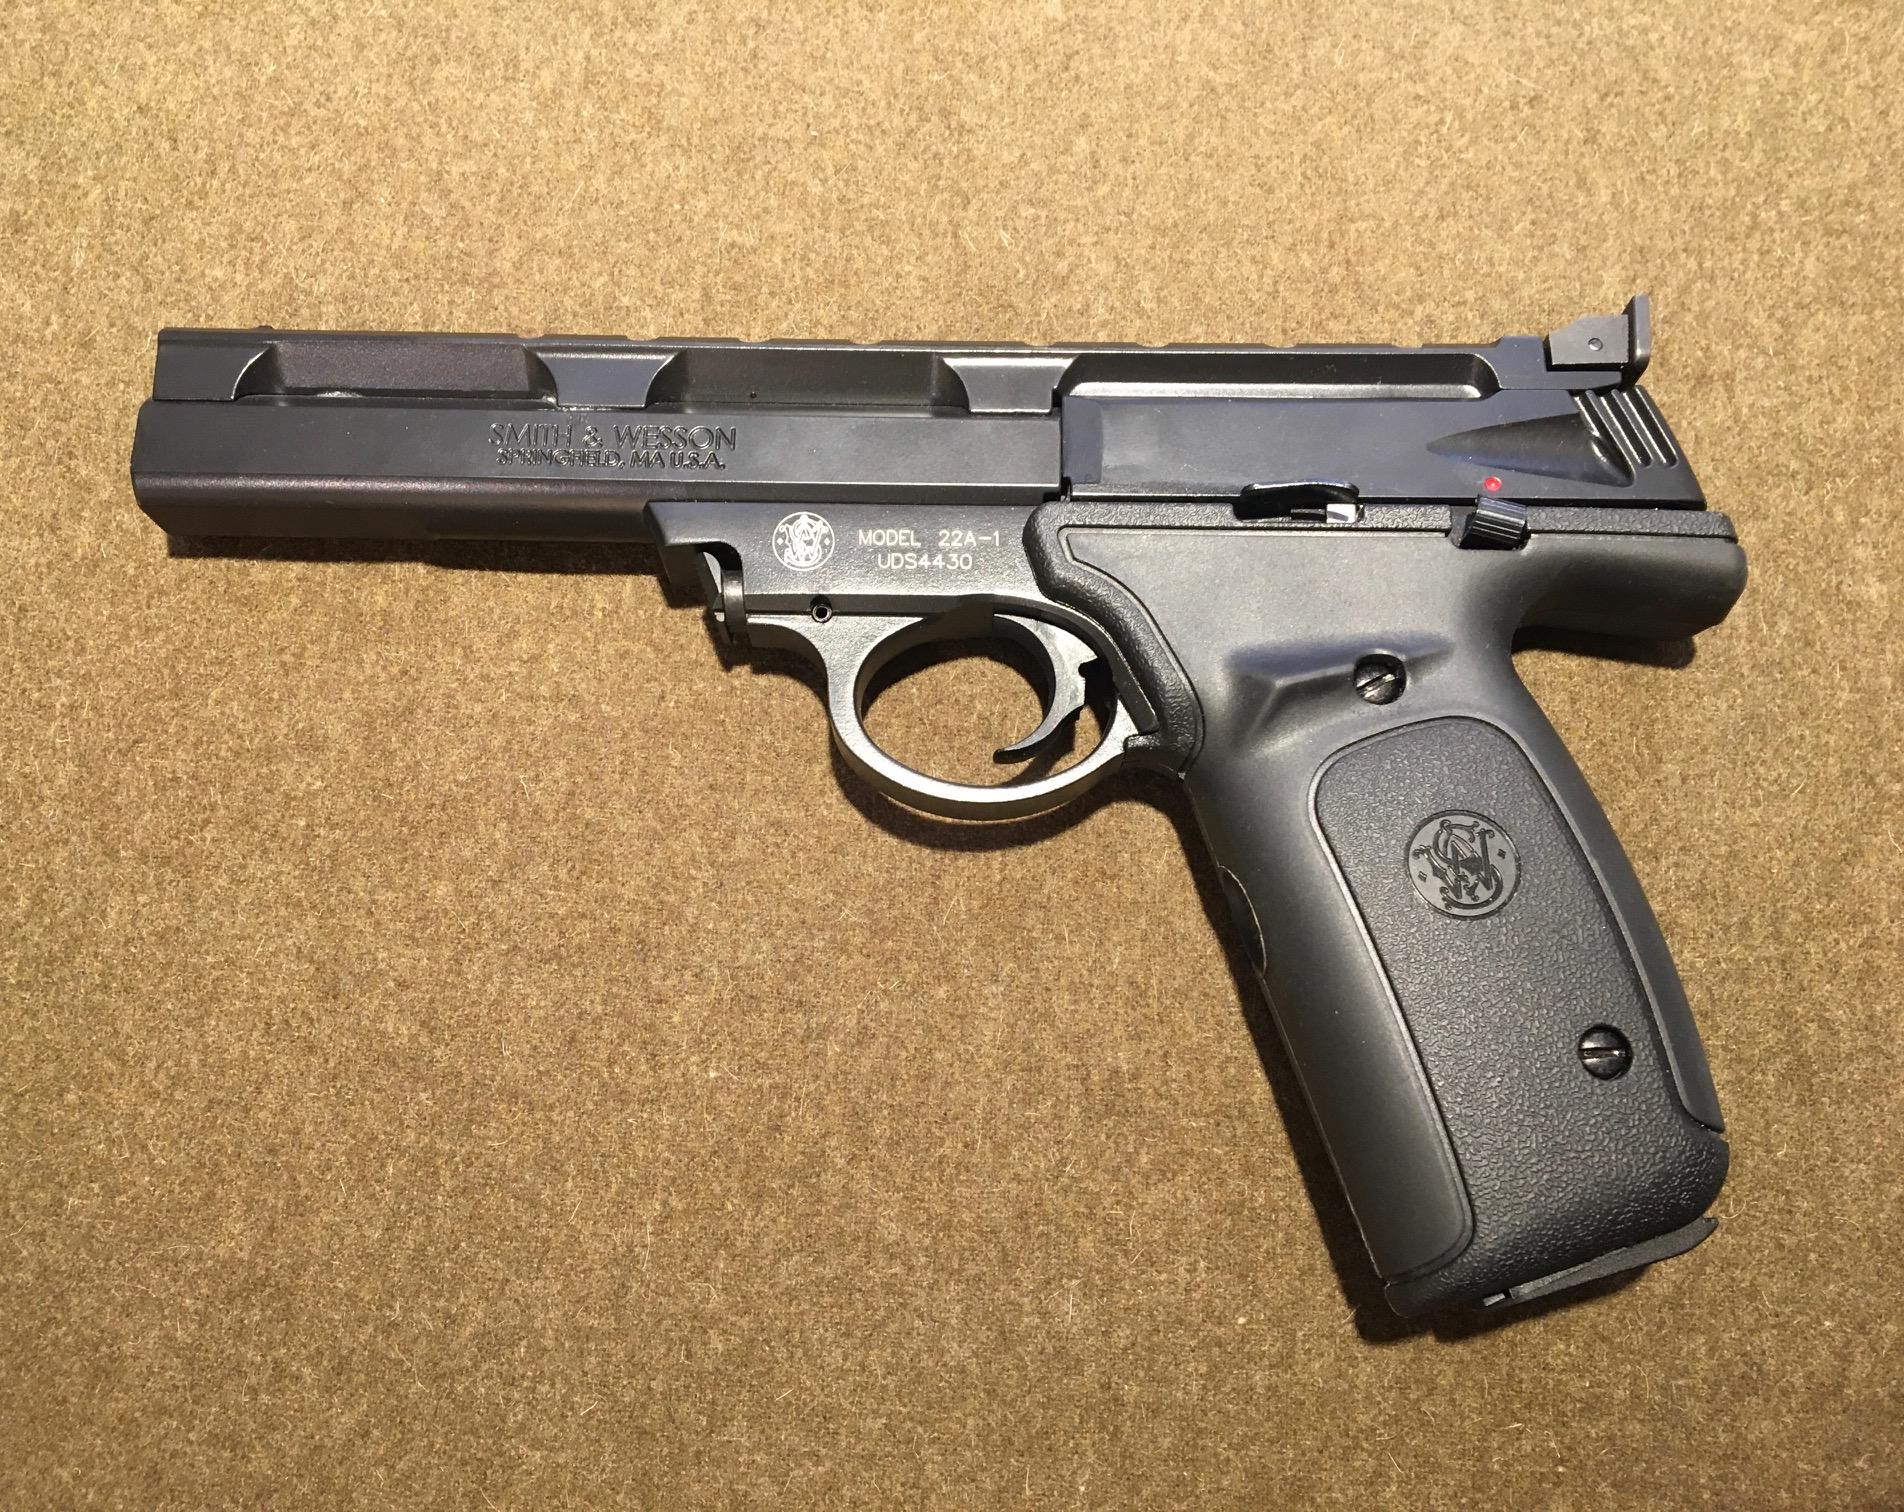 S&W Modell 22A1-1